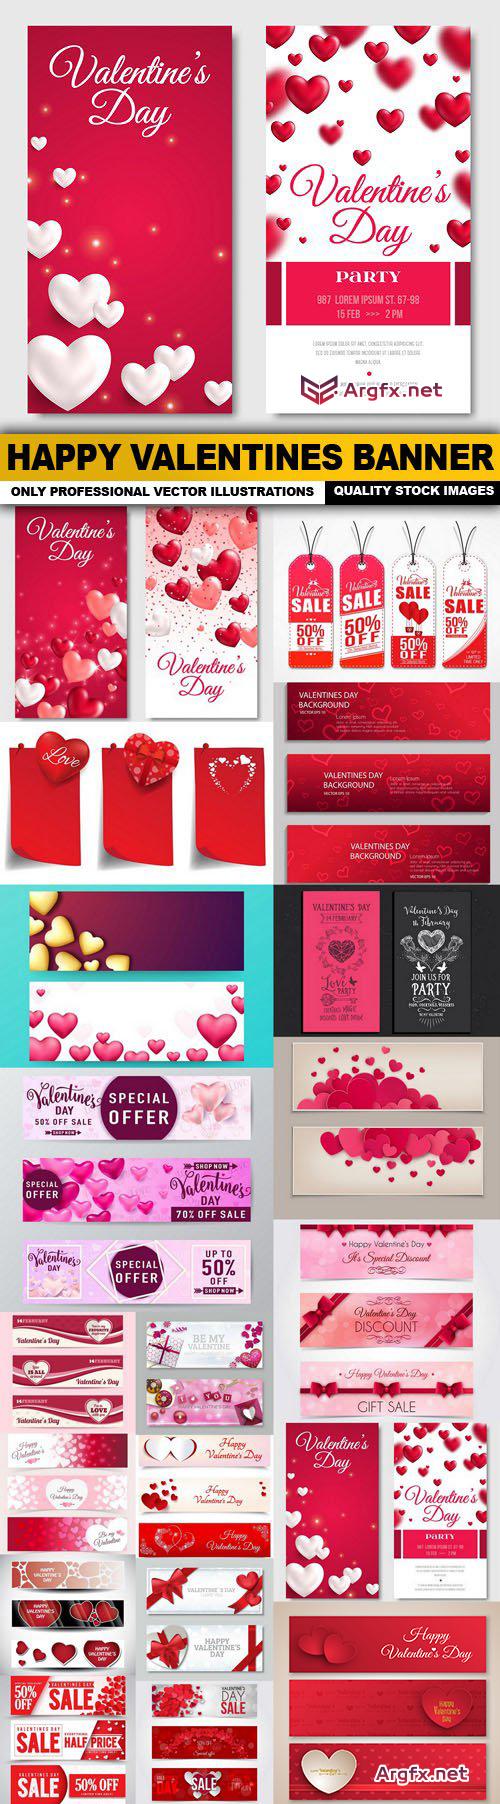 Happy Valentines Banner - 24 Vector